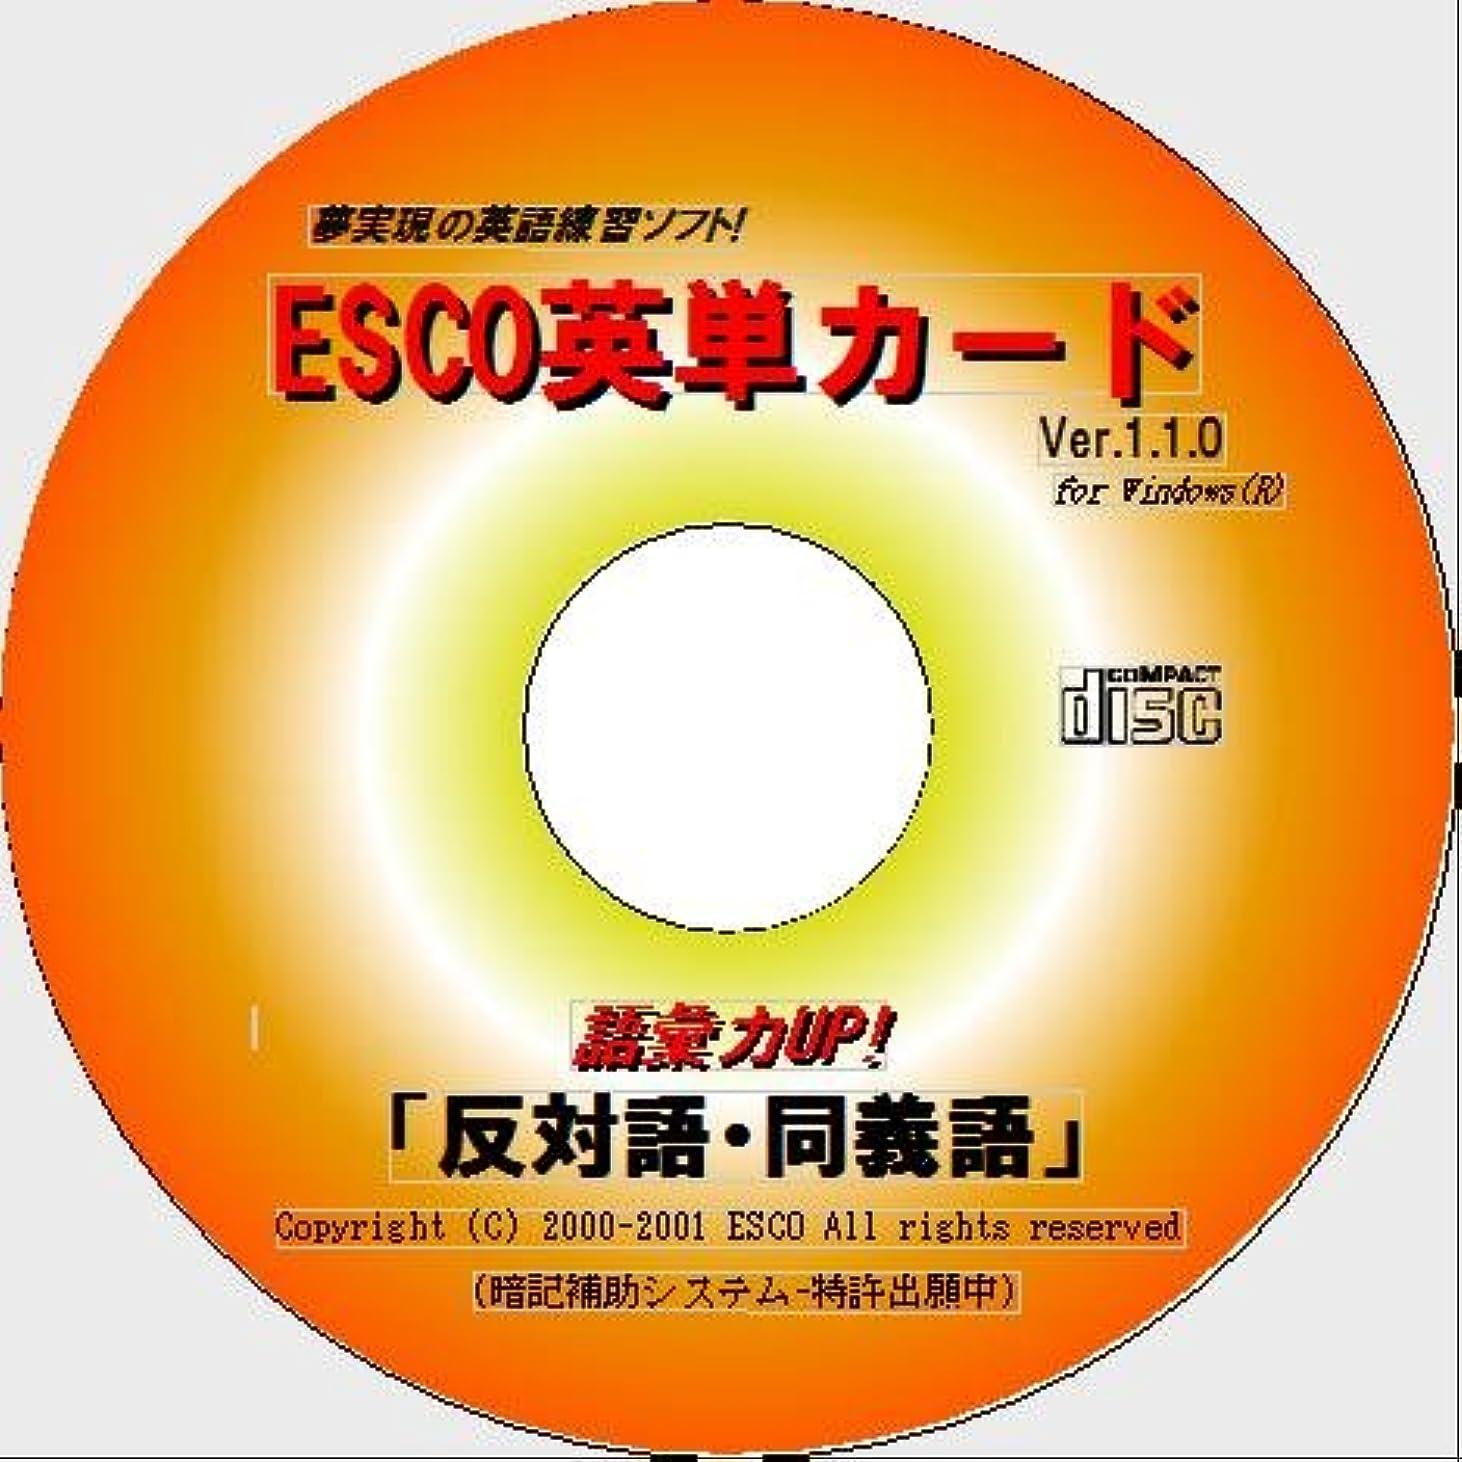 ESCO英単カード 語彙力UP!「反対語?同義語」 618カード